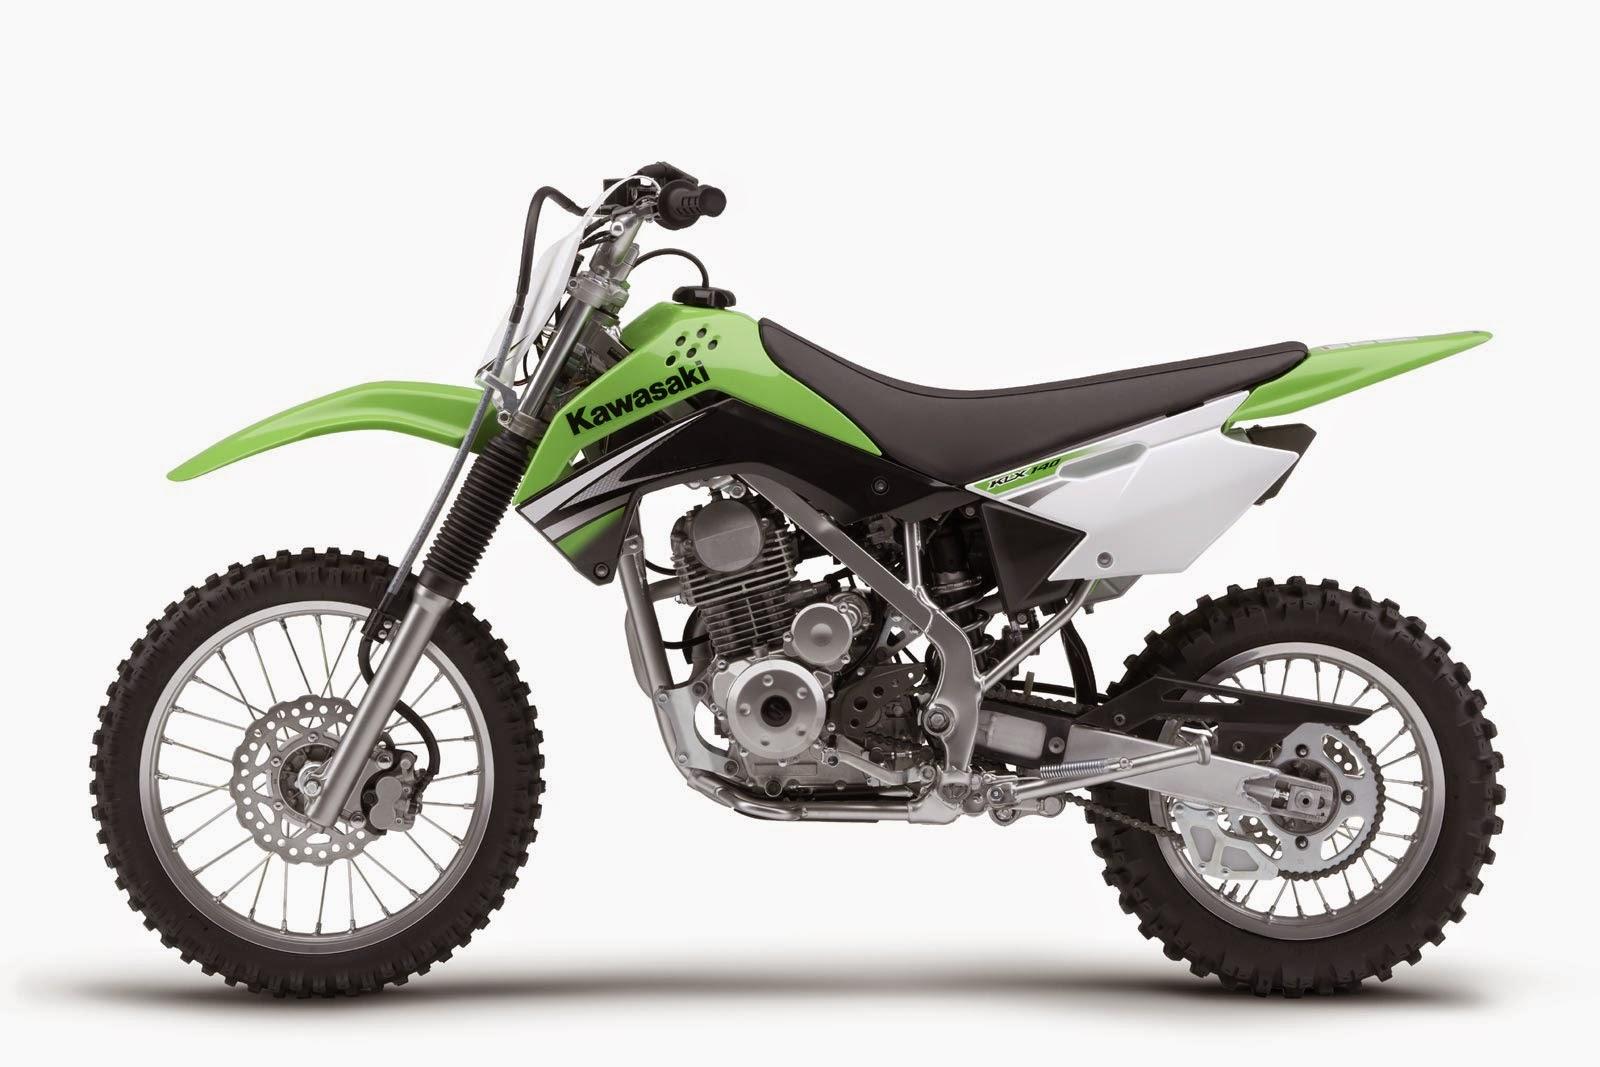 modifikasi motor trail kawasaki klx 150 terbaru - sukaon